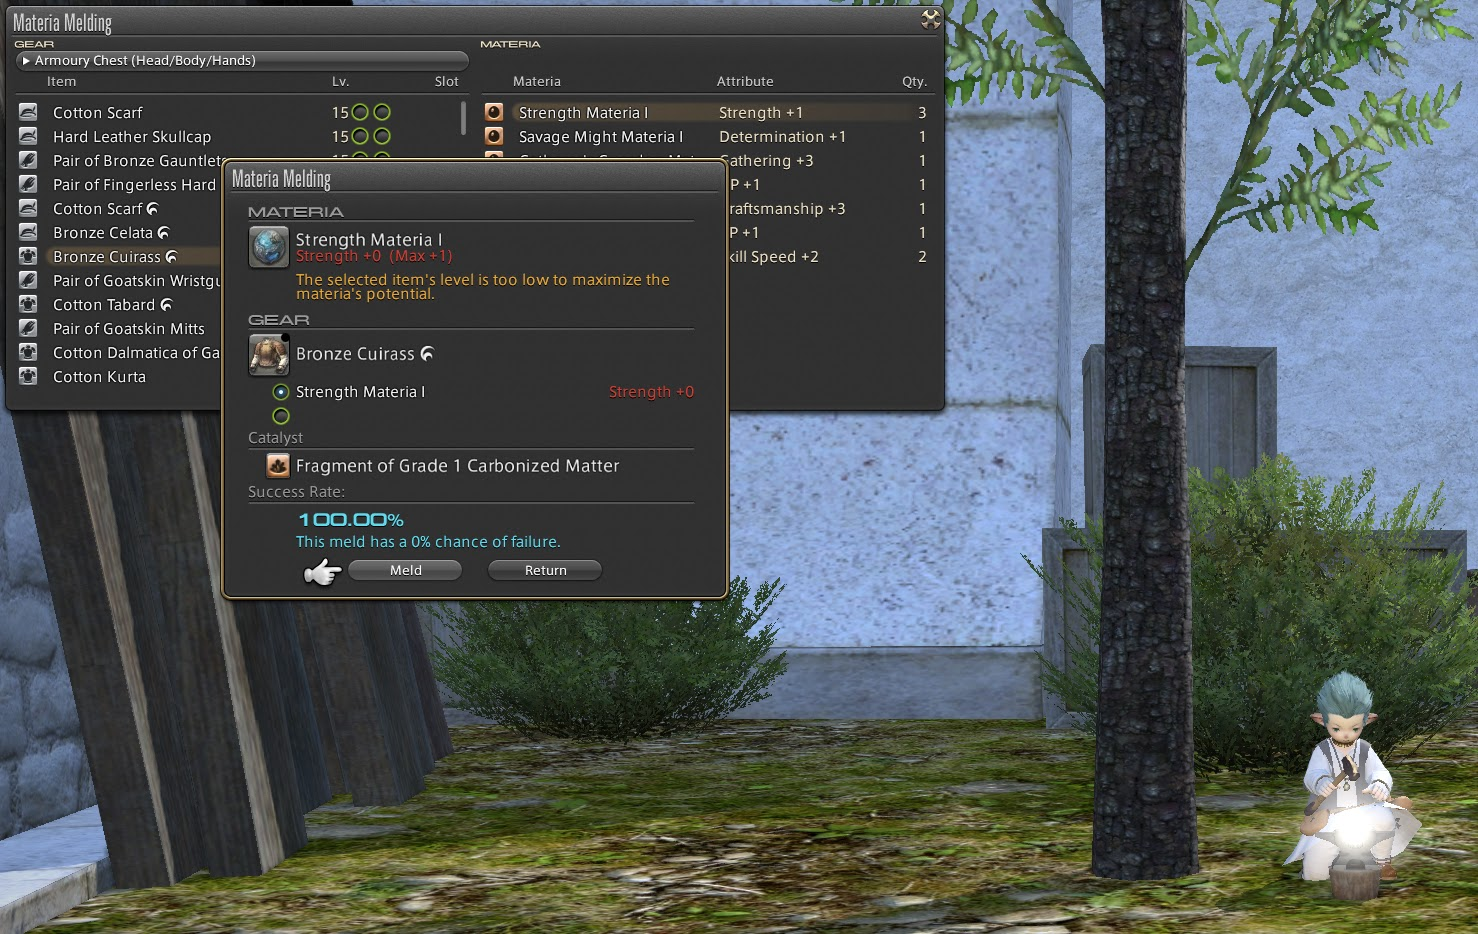 Ffxiv materia slots - Expansion slots wiki